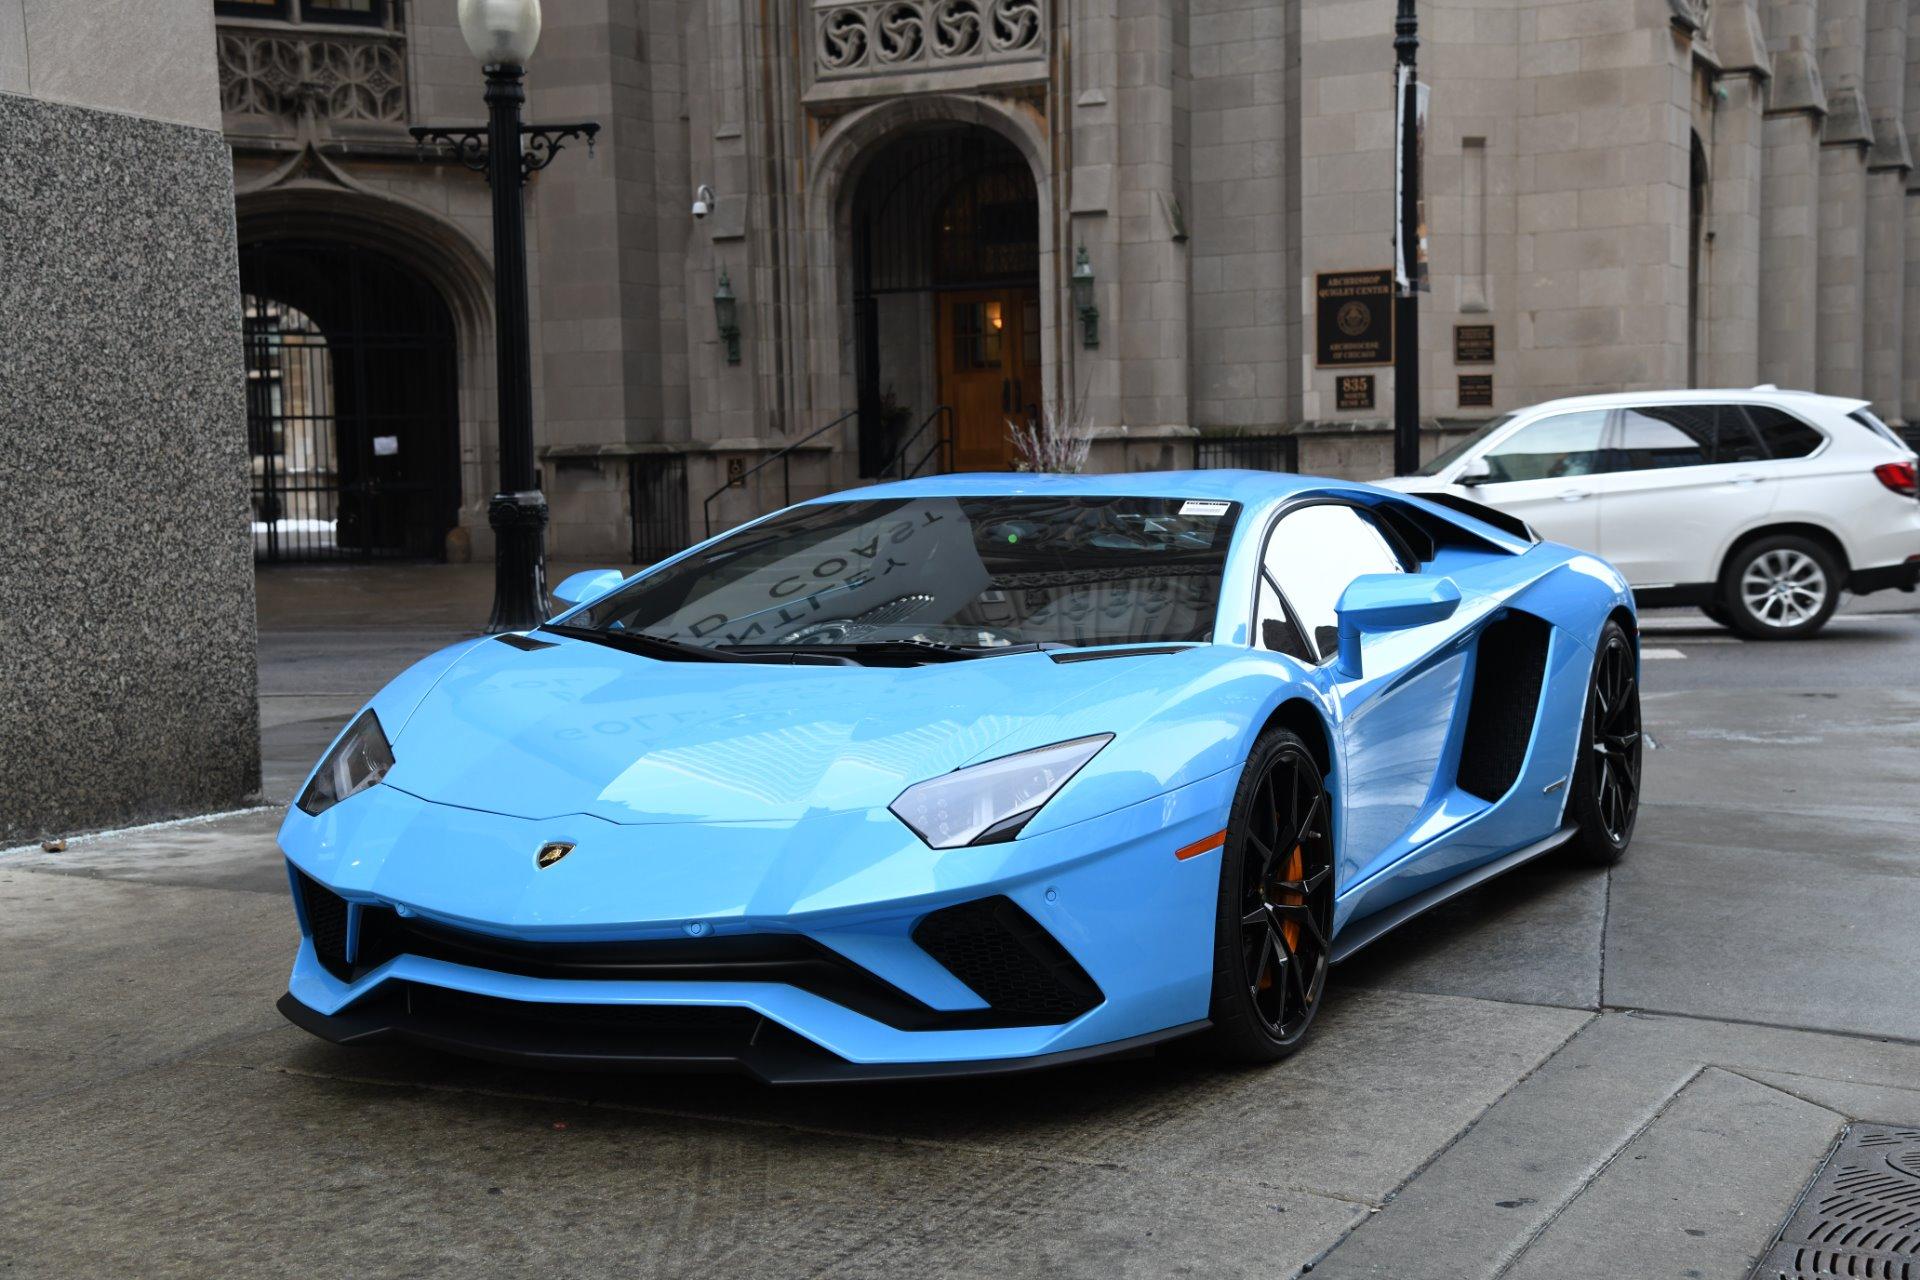 2018 lamborghini aventador blue. beautiful aventador new 2018 lamborghini aventador s lp 7404  chicago il inside lamborghini aventador blue